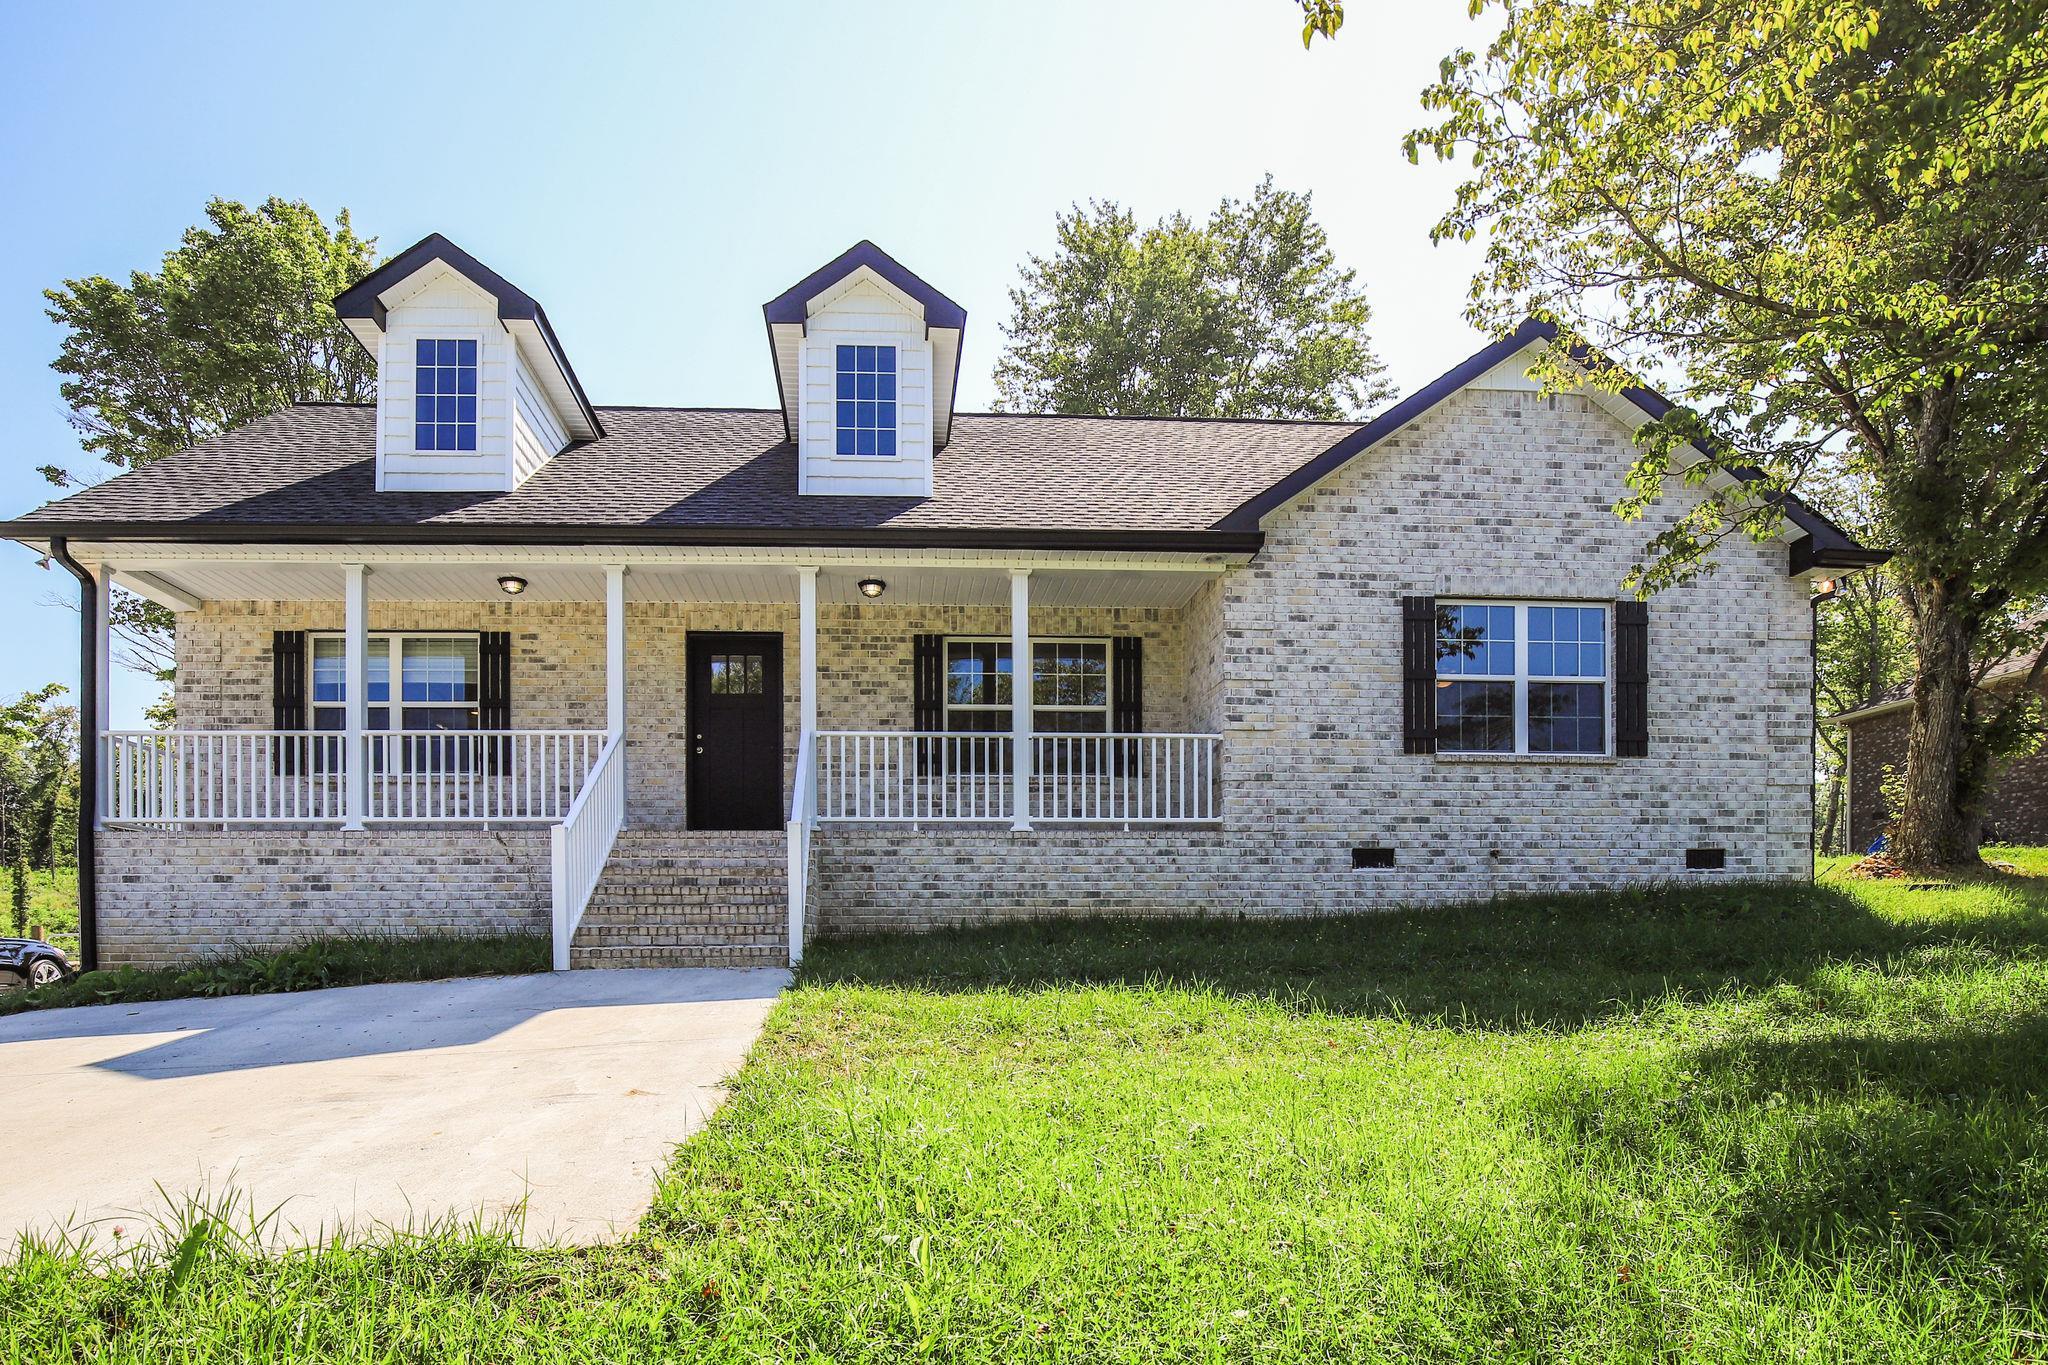 1688 rock bridge rd, Bethpage, TN 37022 - Bethpage, TN real estate listing